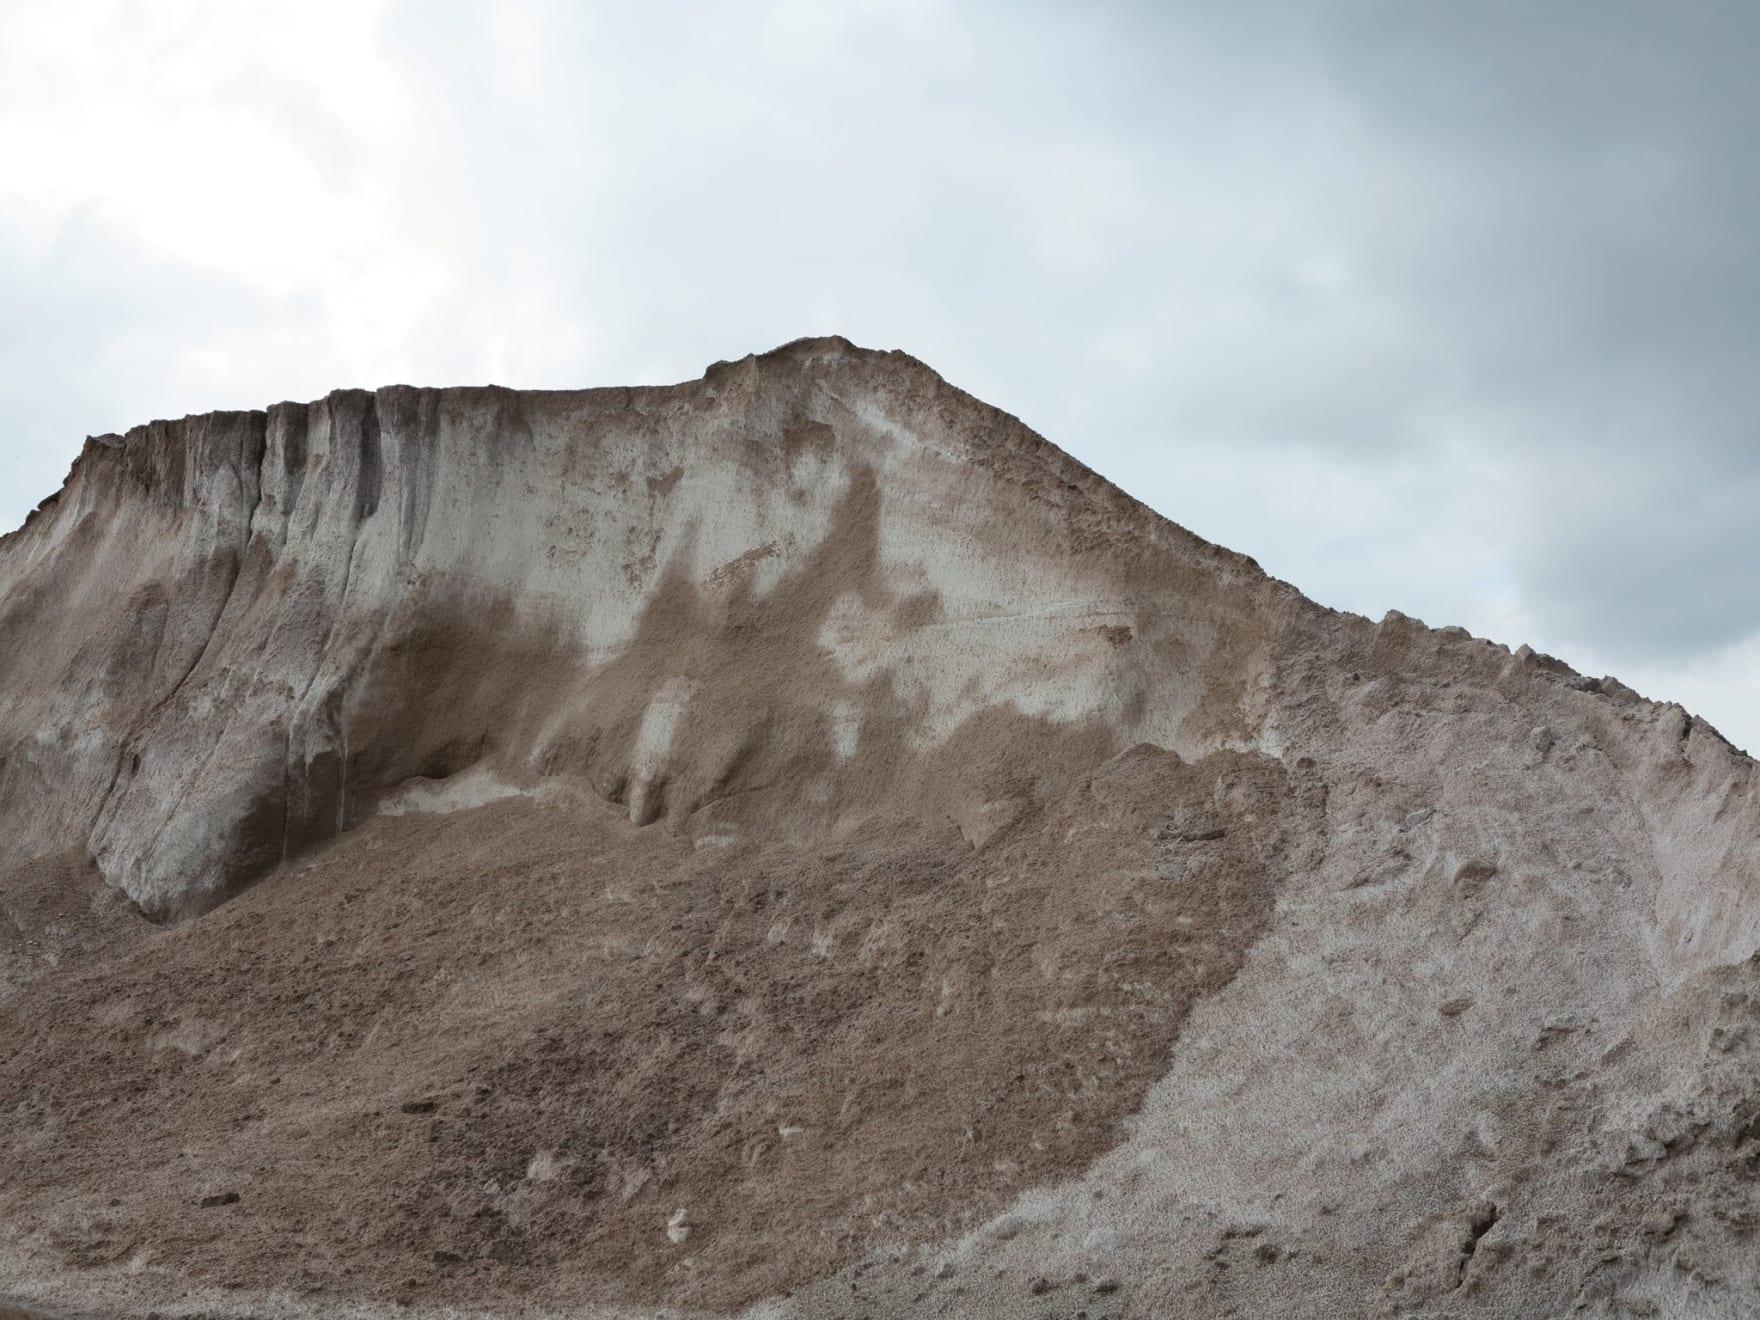 Jennifer Douglas, It's a mountain at the moment, 2012